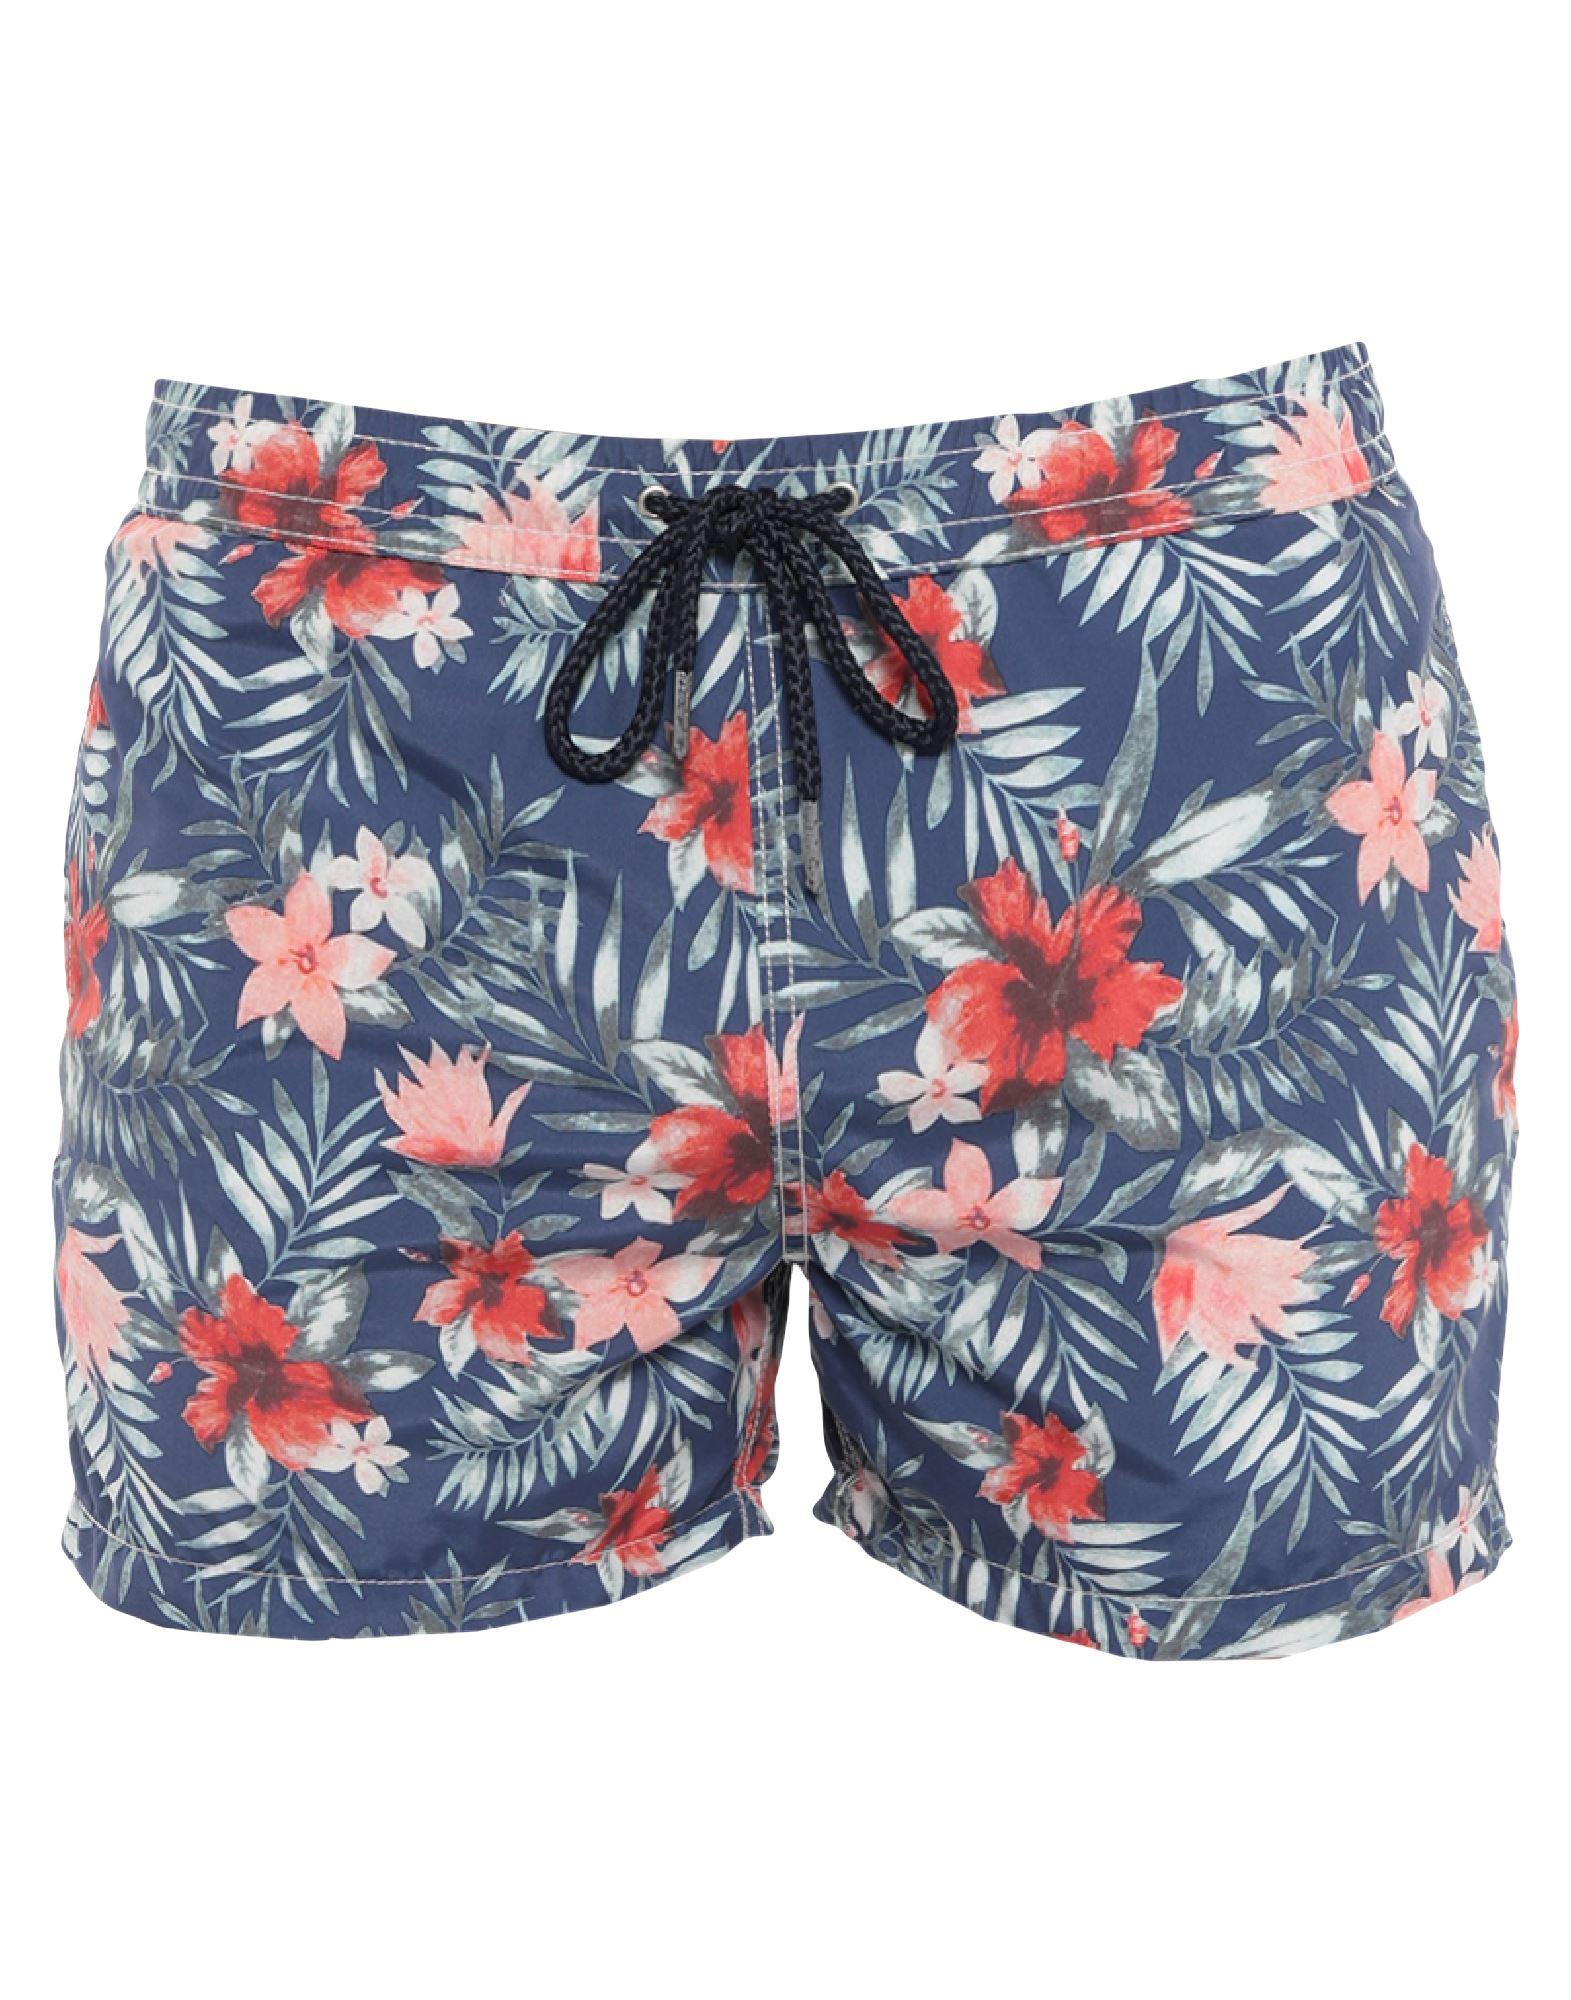 AT.P.CO Swim trunks - Item 47280733